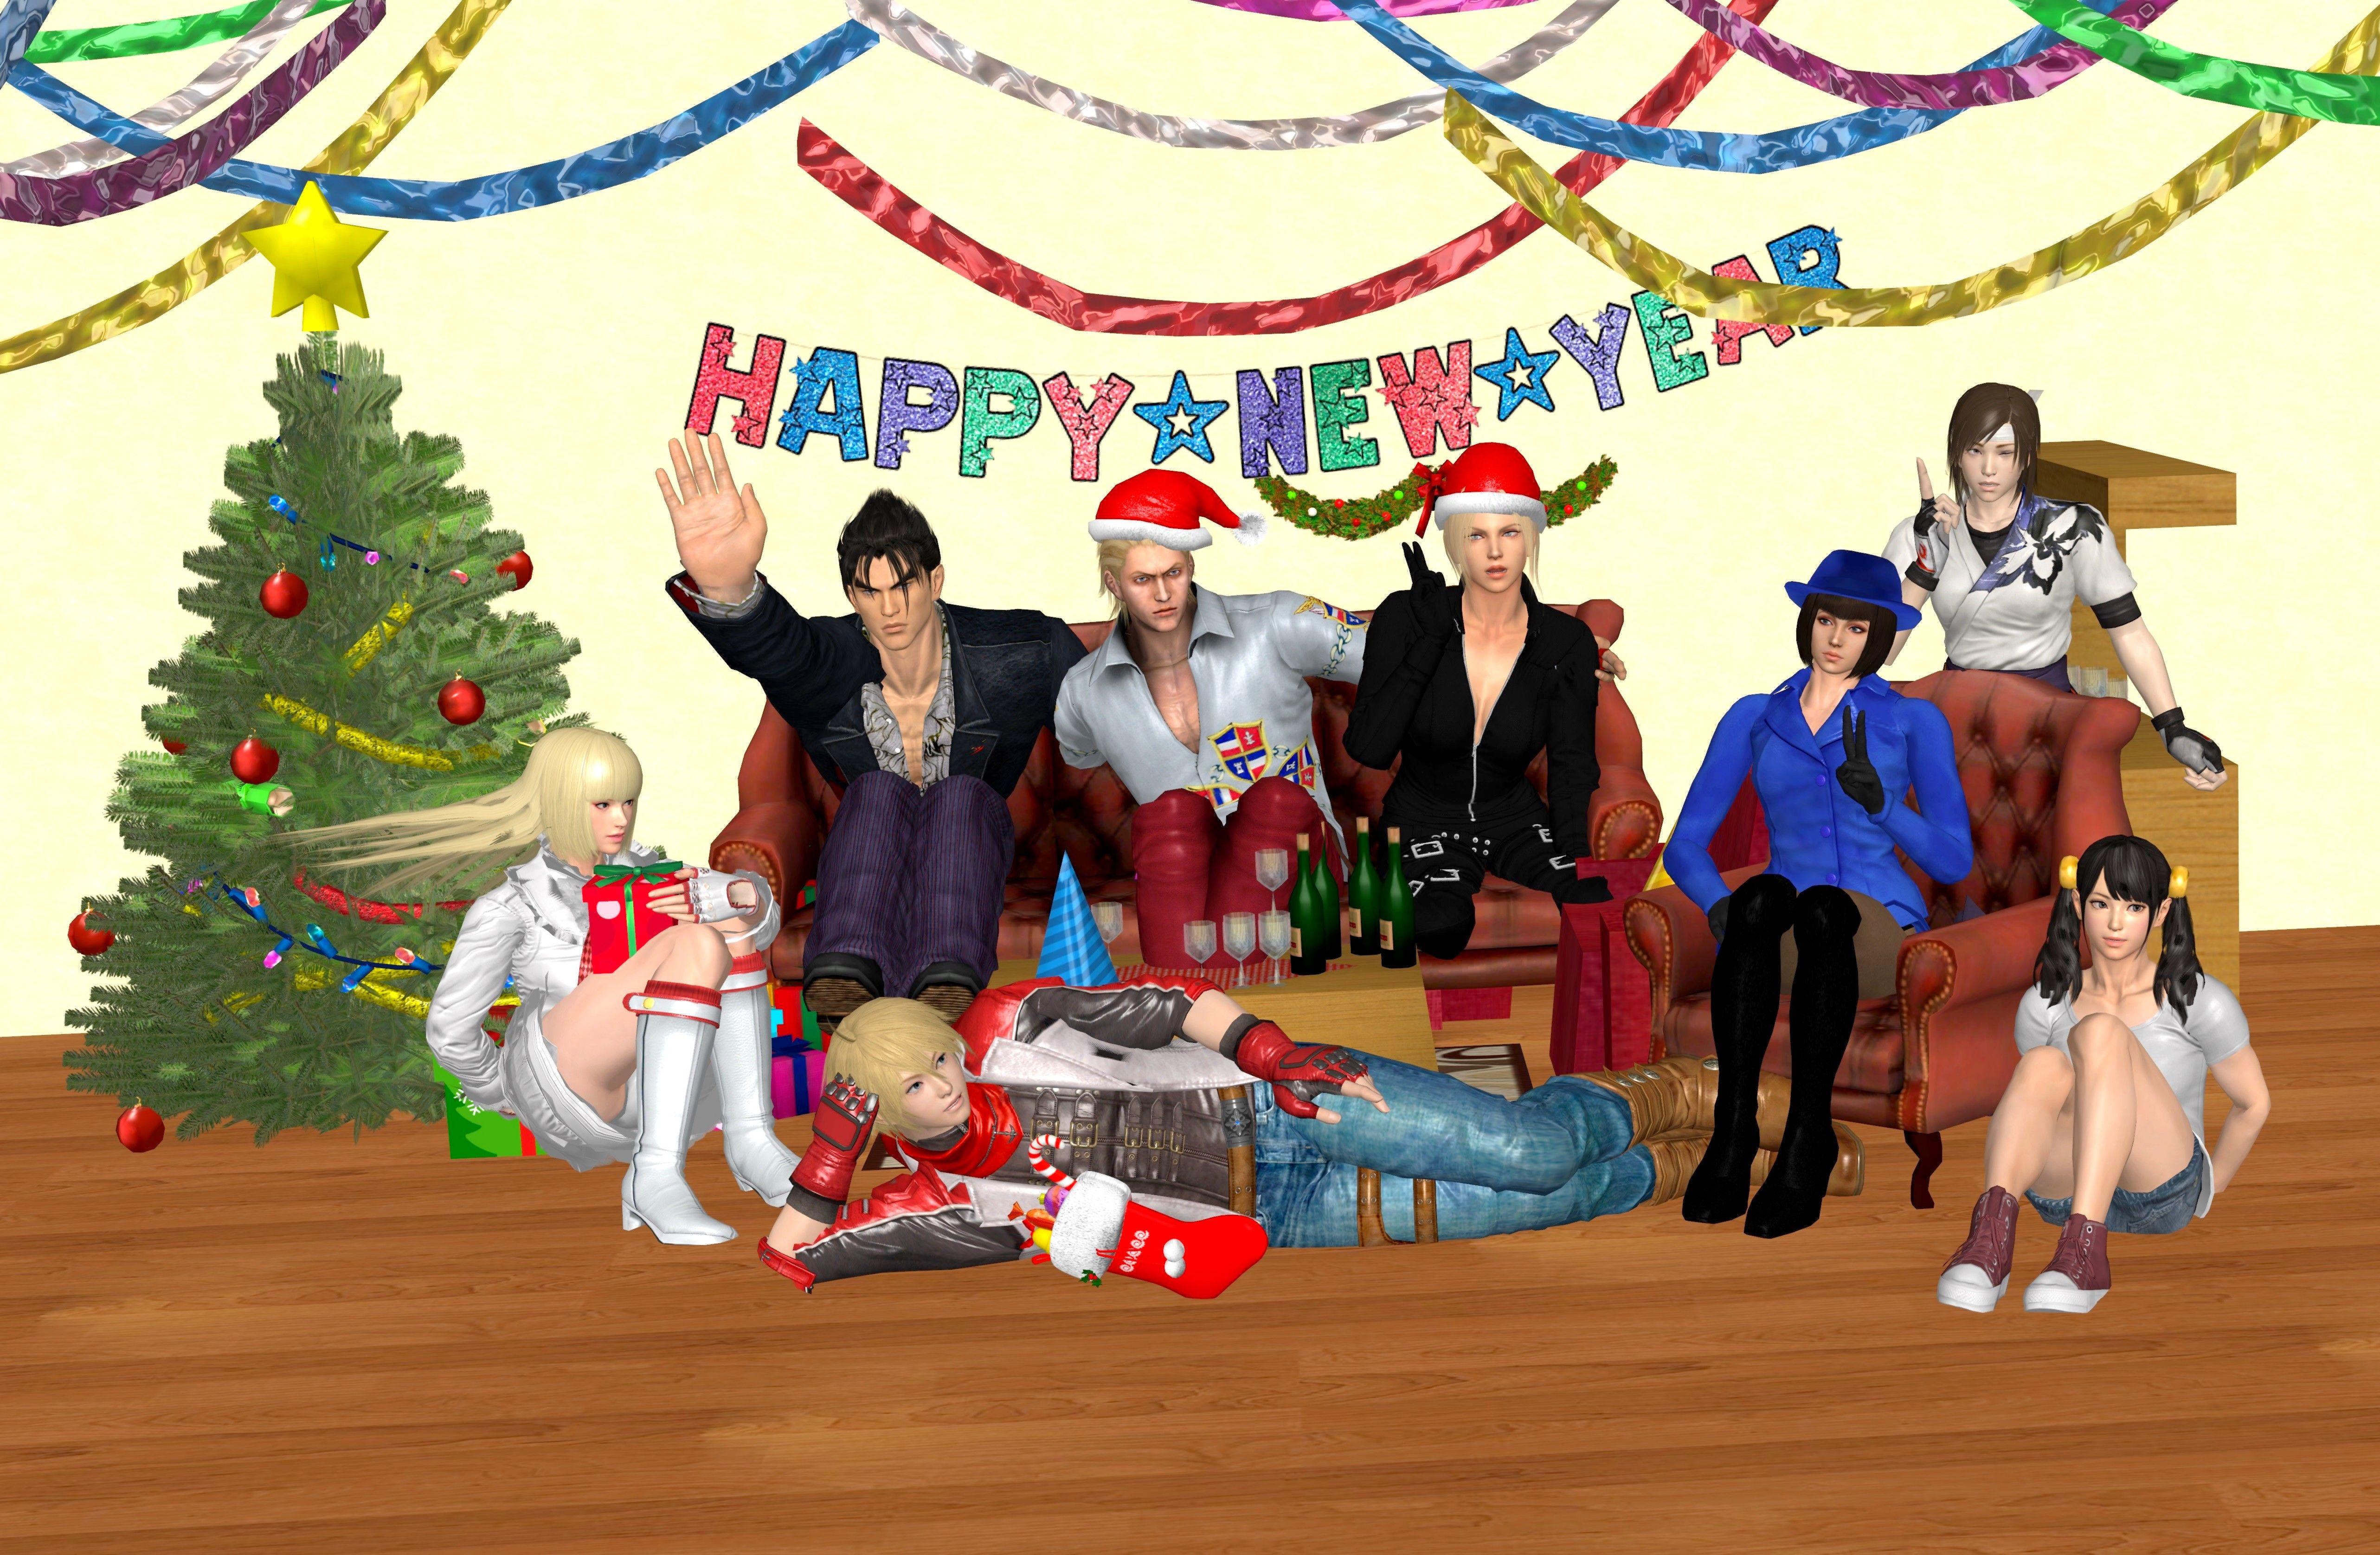 Tekken Christmas by Allochka-Dragunova